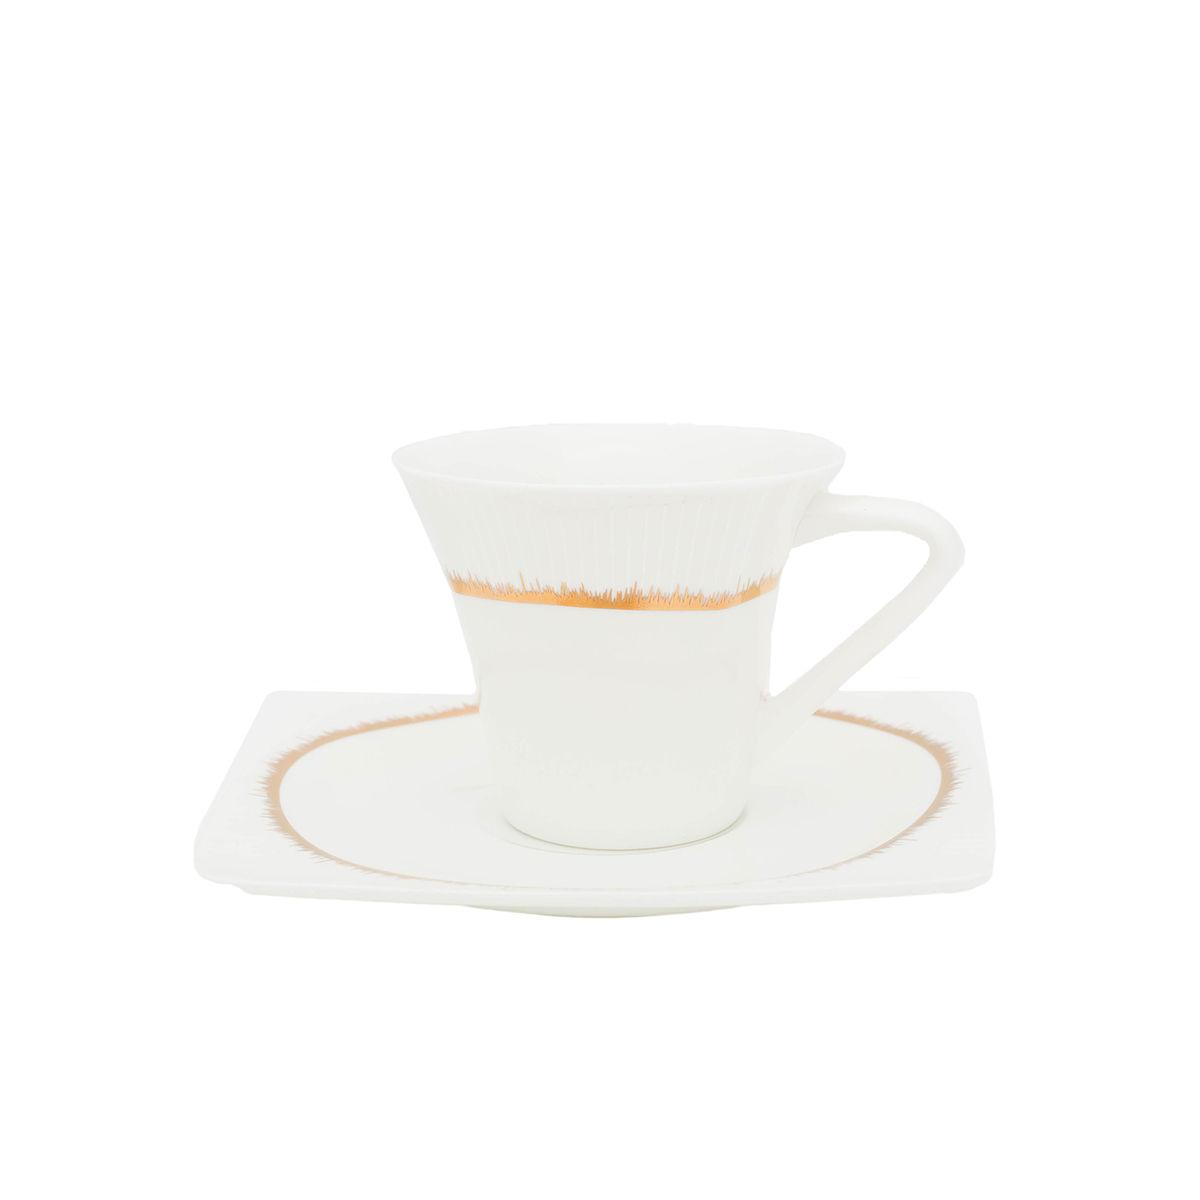 HELIOS Serviciu cafea portelan 6 persoane 100 ml